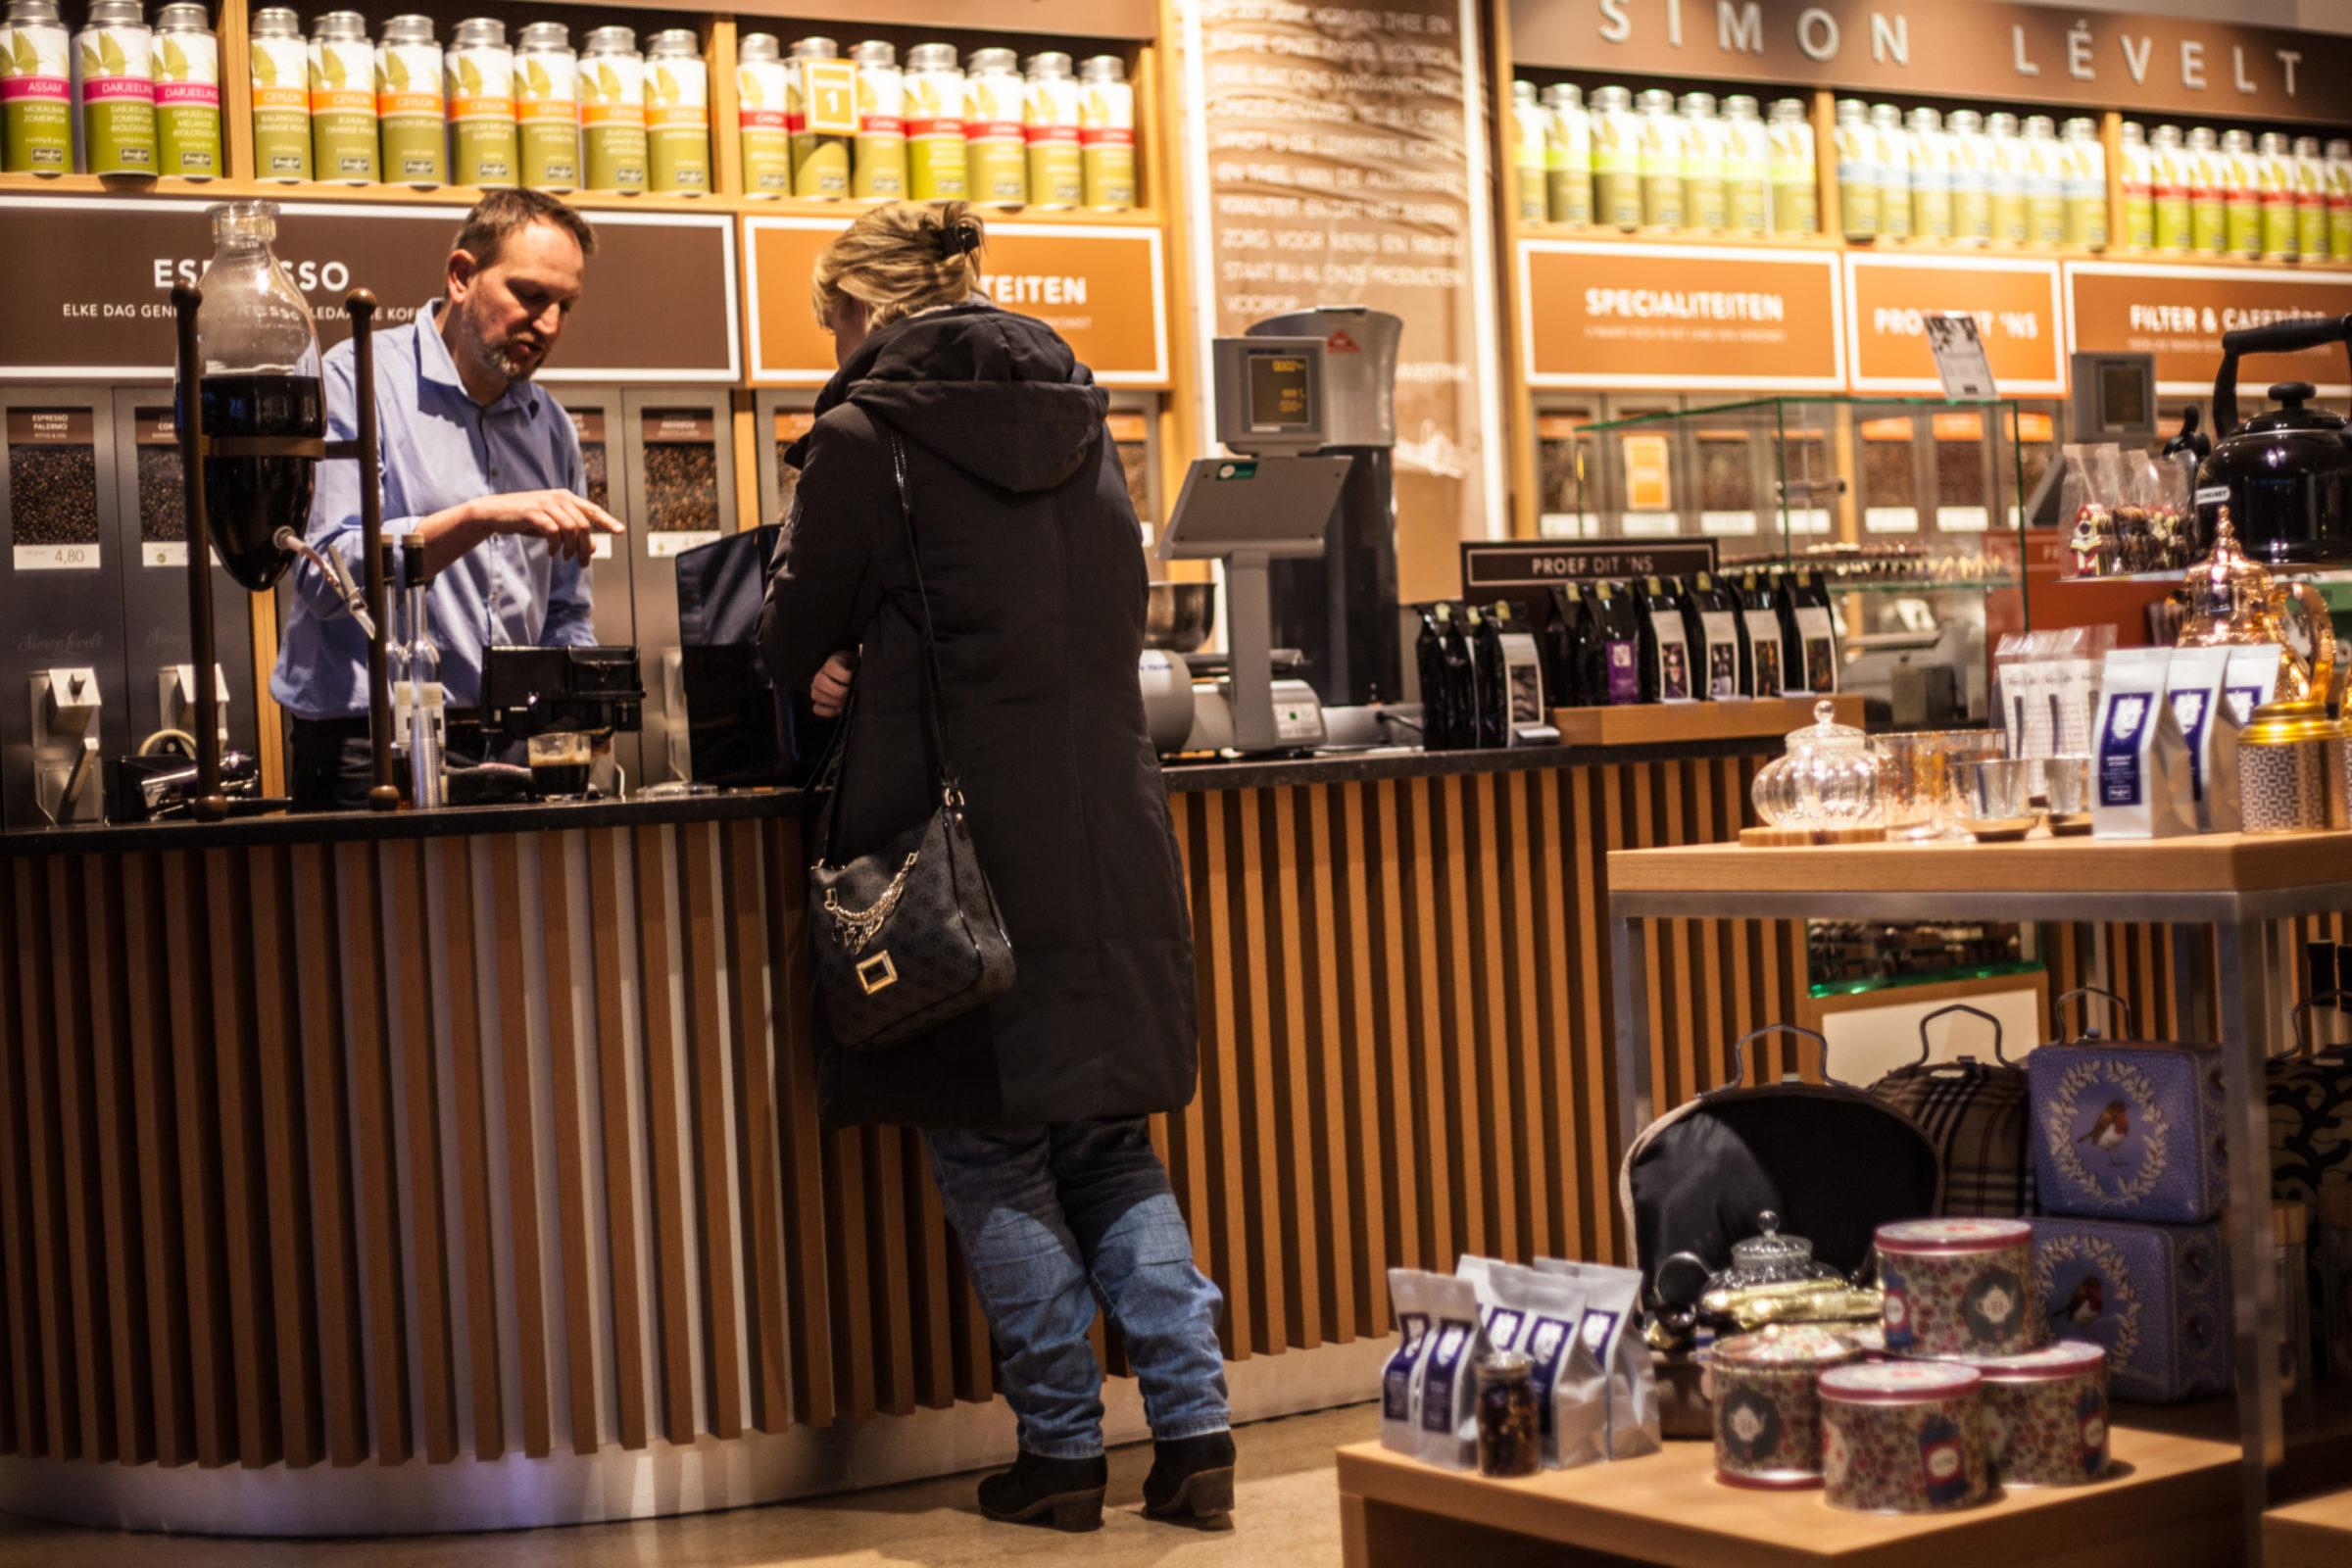 2014 Simon Levelt Raadhuisstraat Winkelen 7